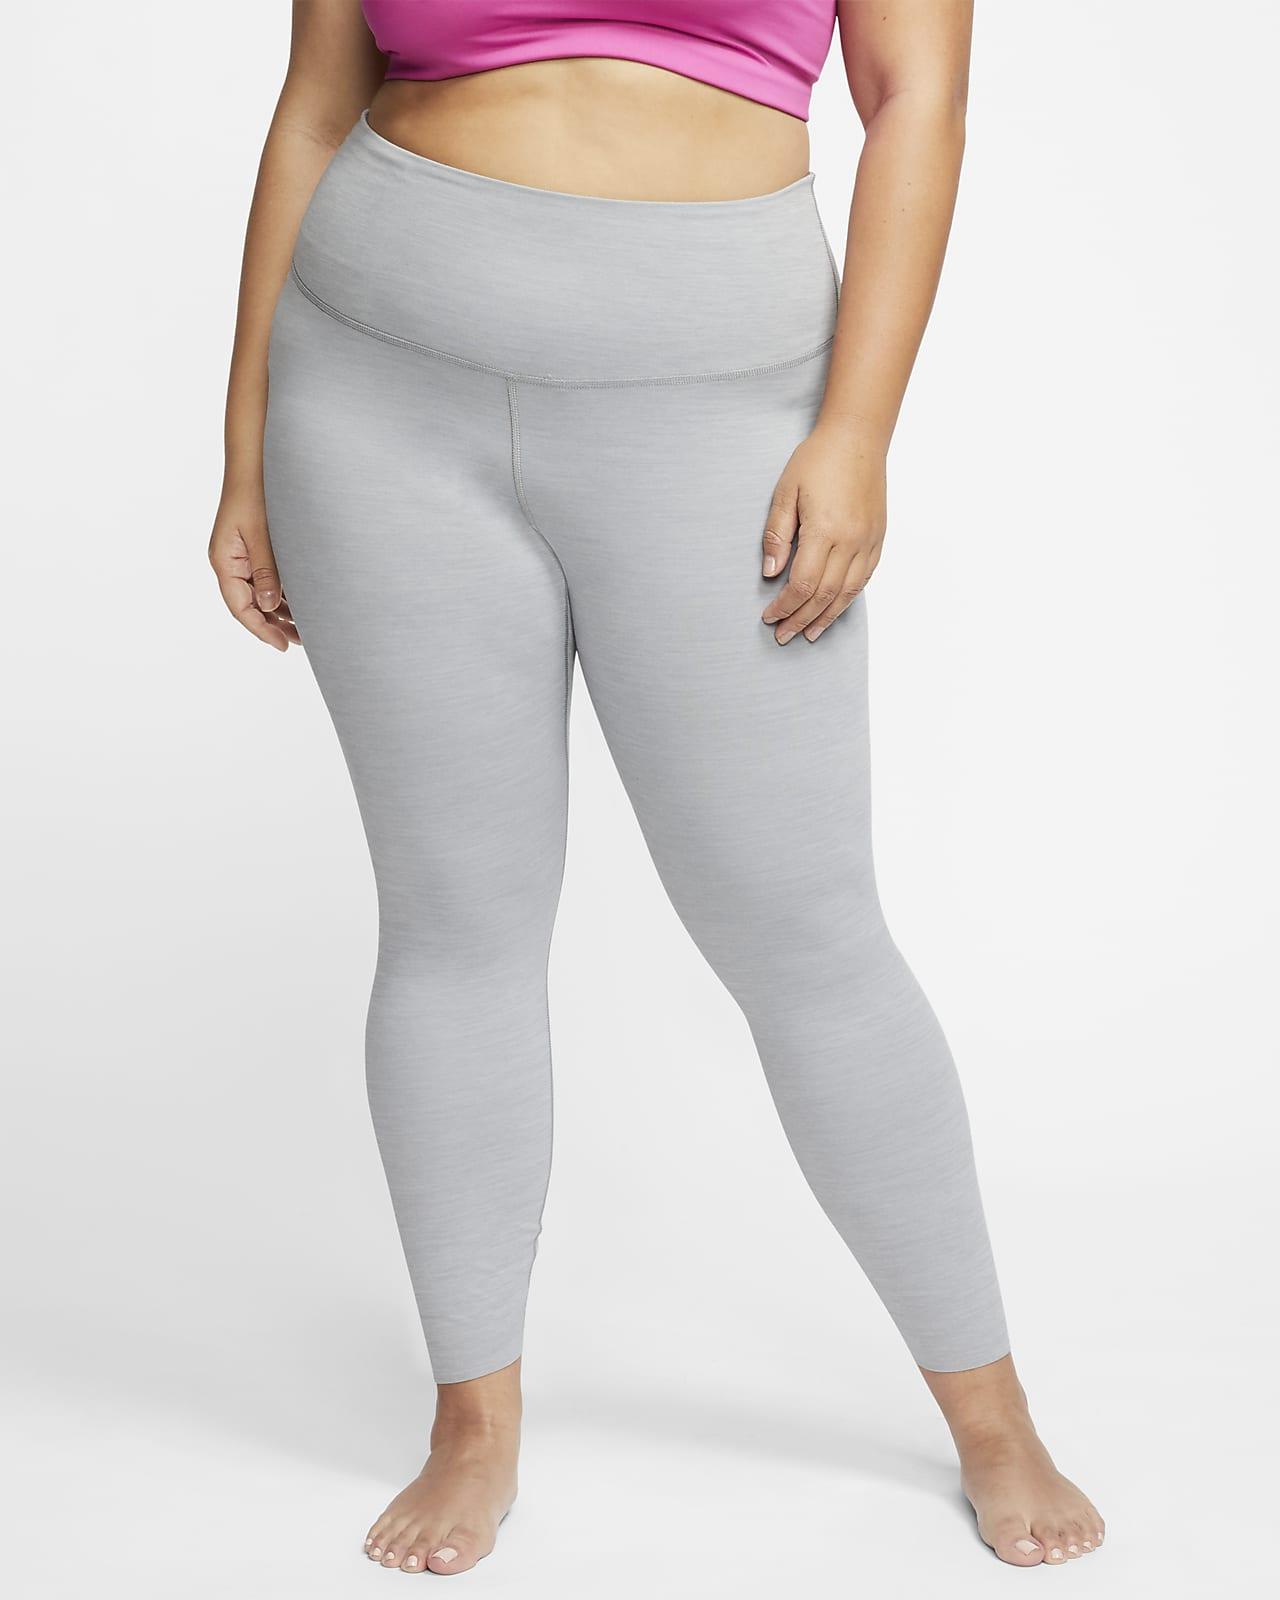 Leggings de tela Infinalon y cintura alta de 7/8 para mujer Nike Yoga Luxe (talla grande)